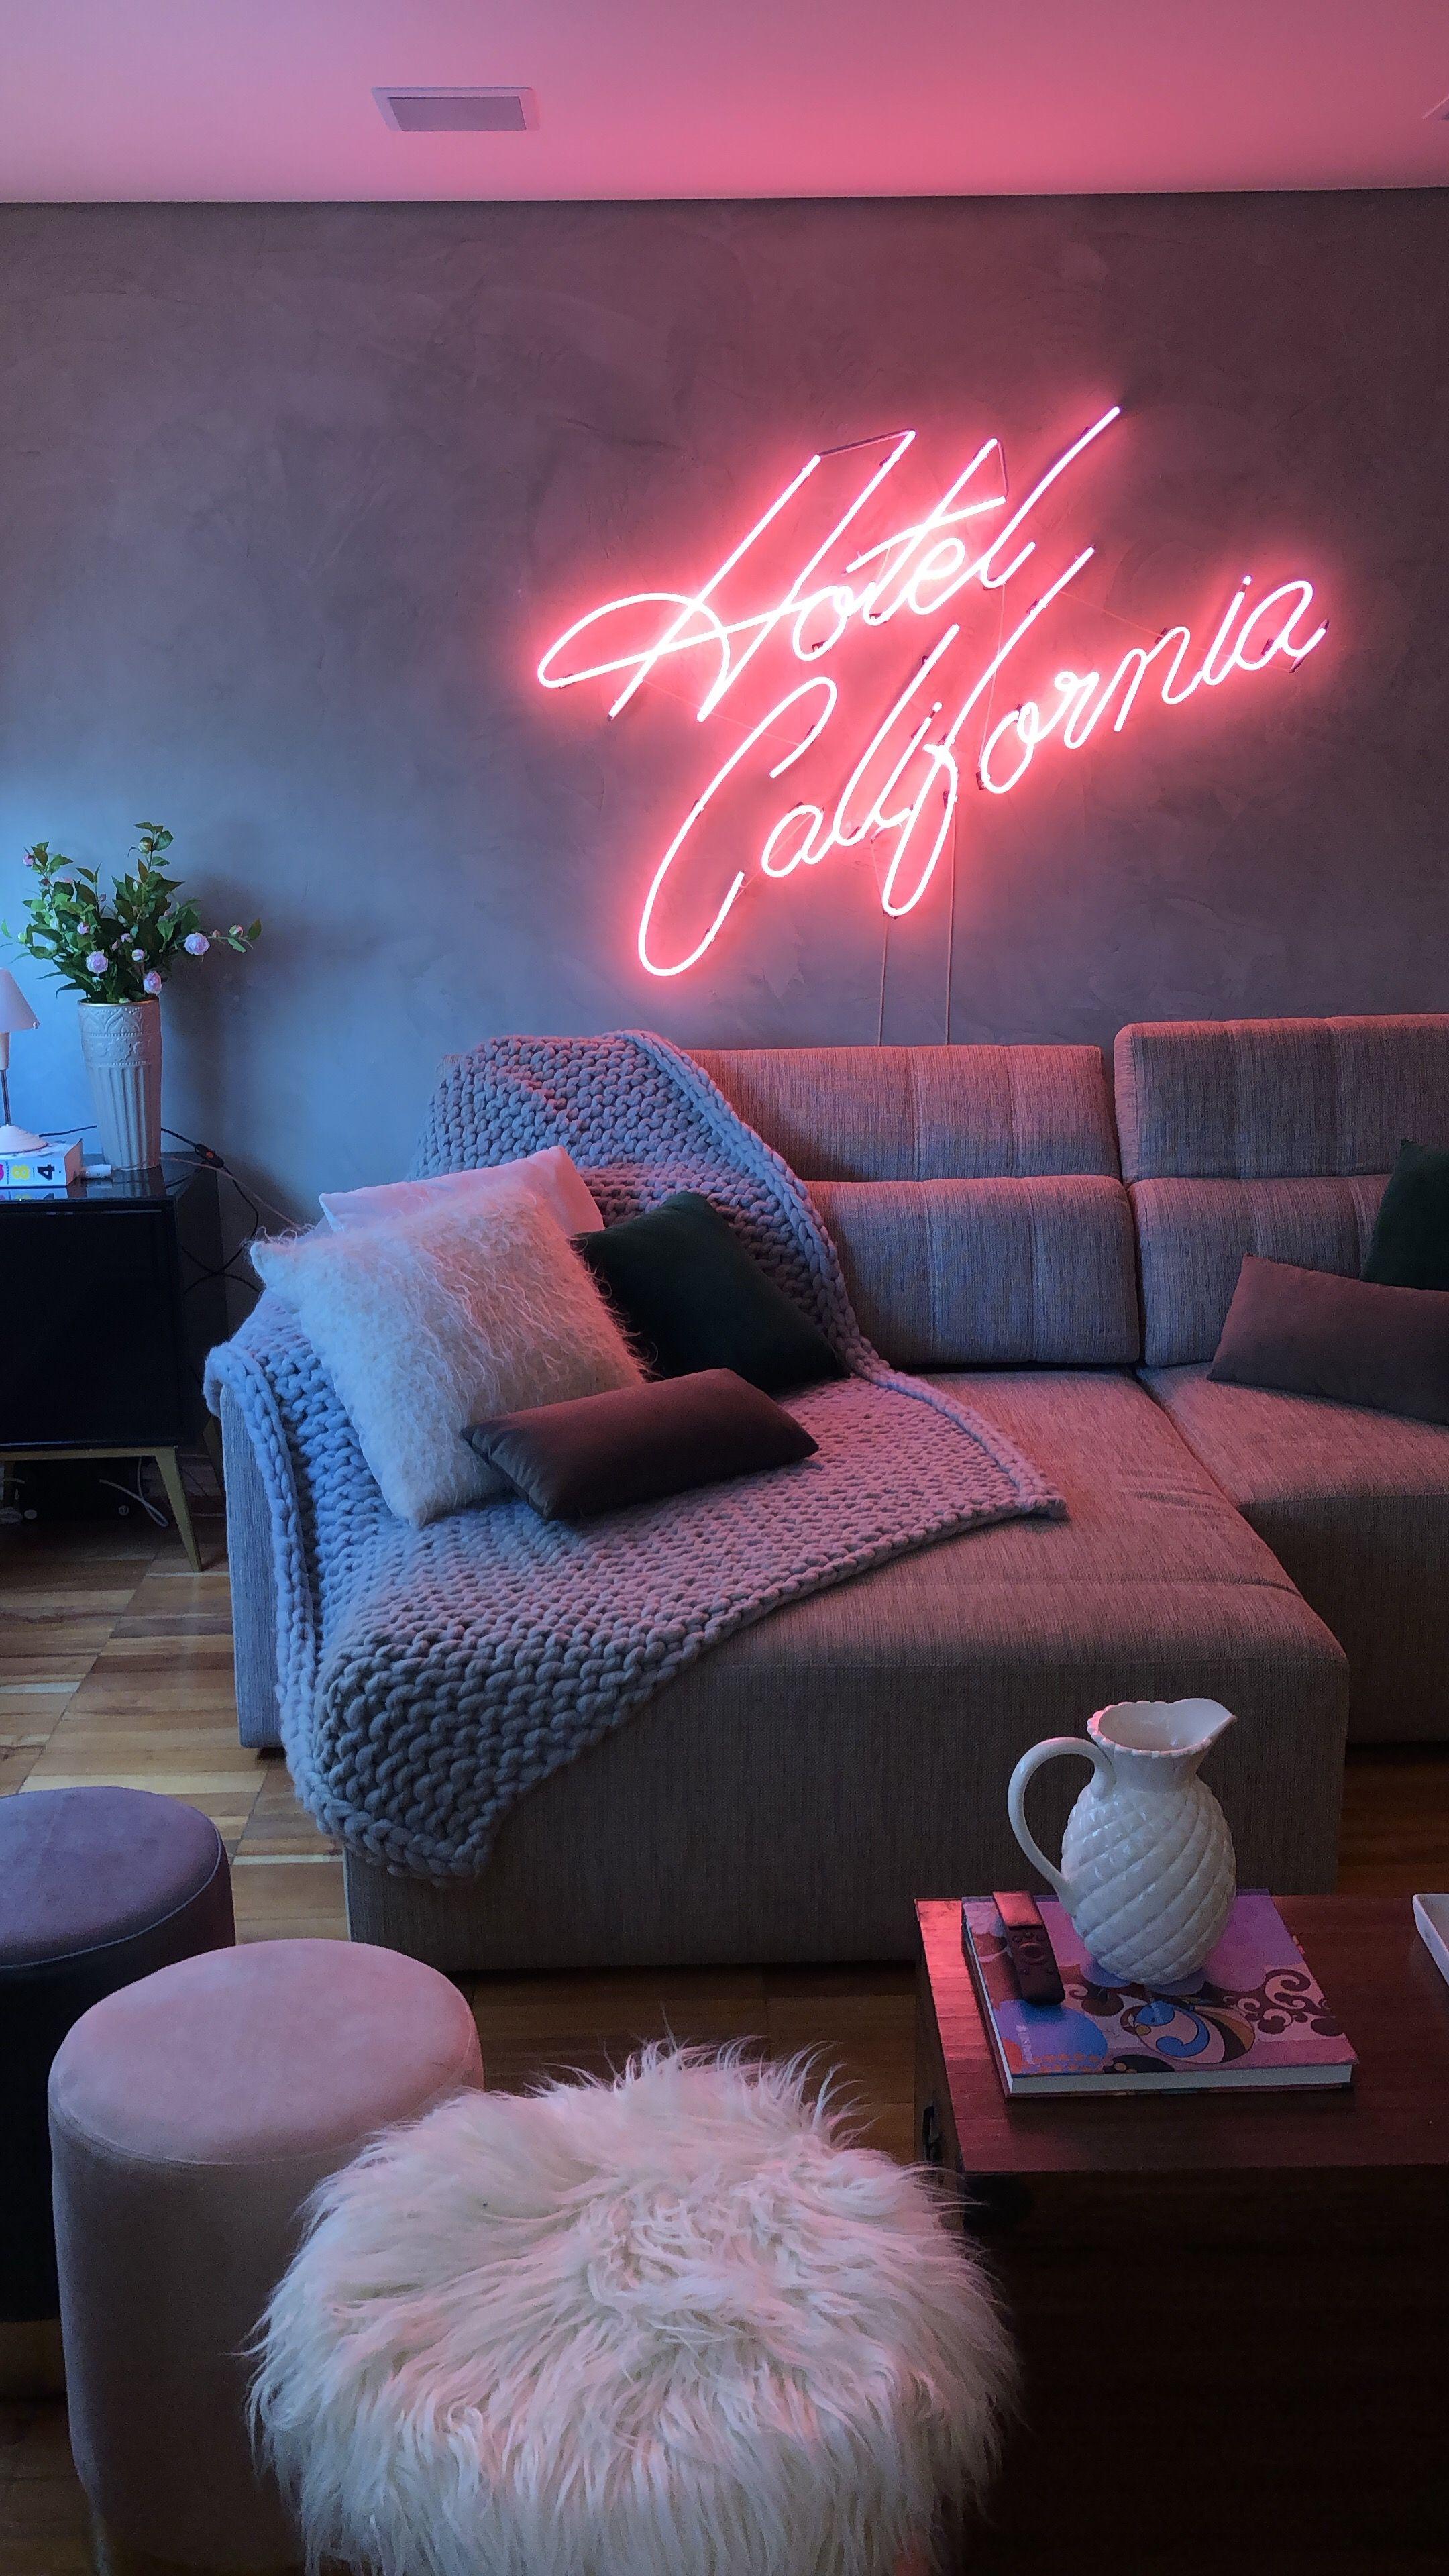 Hotel California Apartment In Sao Paulo Brazil Neon Lights Design Living Room Blanket Decor Stylish Student Pink Neon Bedroom Neon Decor Neon Room #neon #lights #living #room